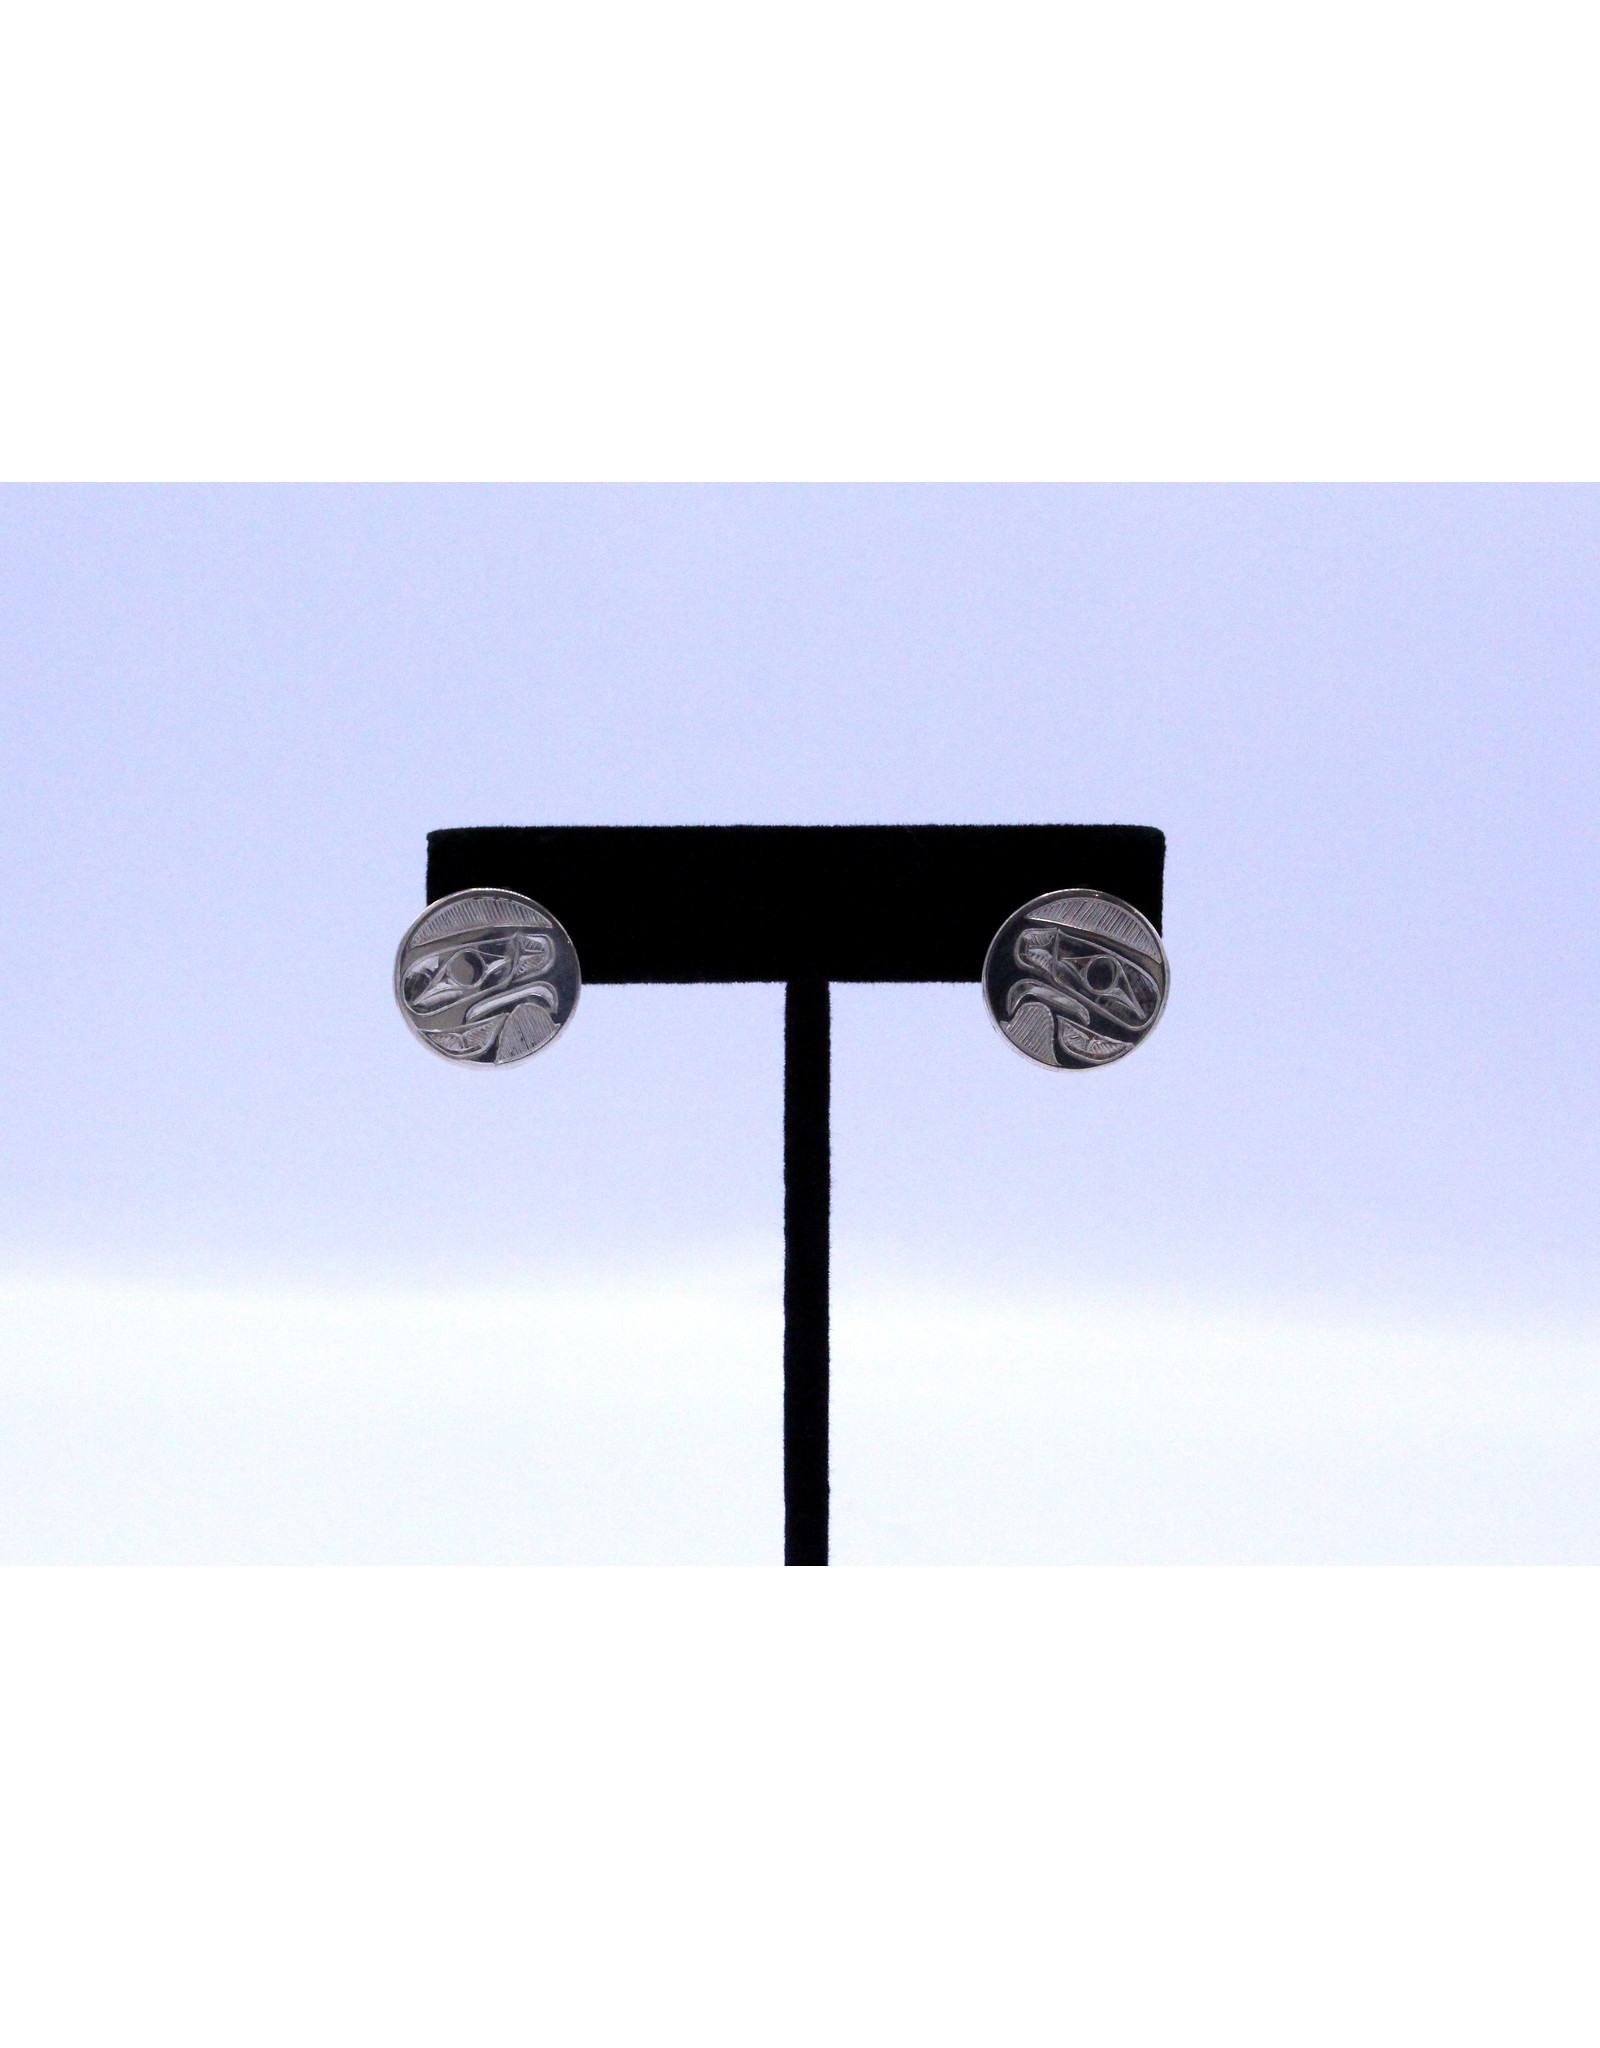 Eagle Round Earrings by Nusmata - NRE05